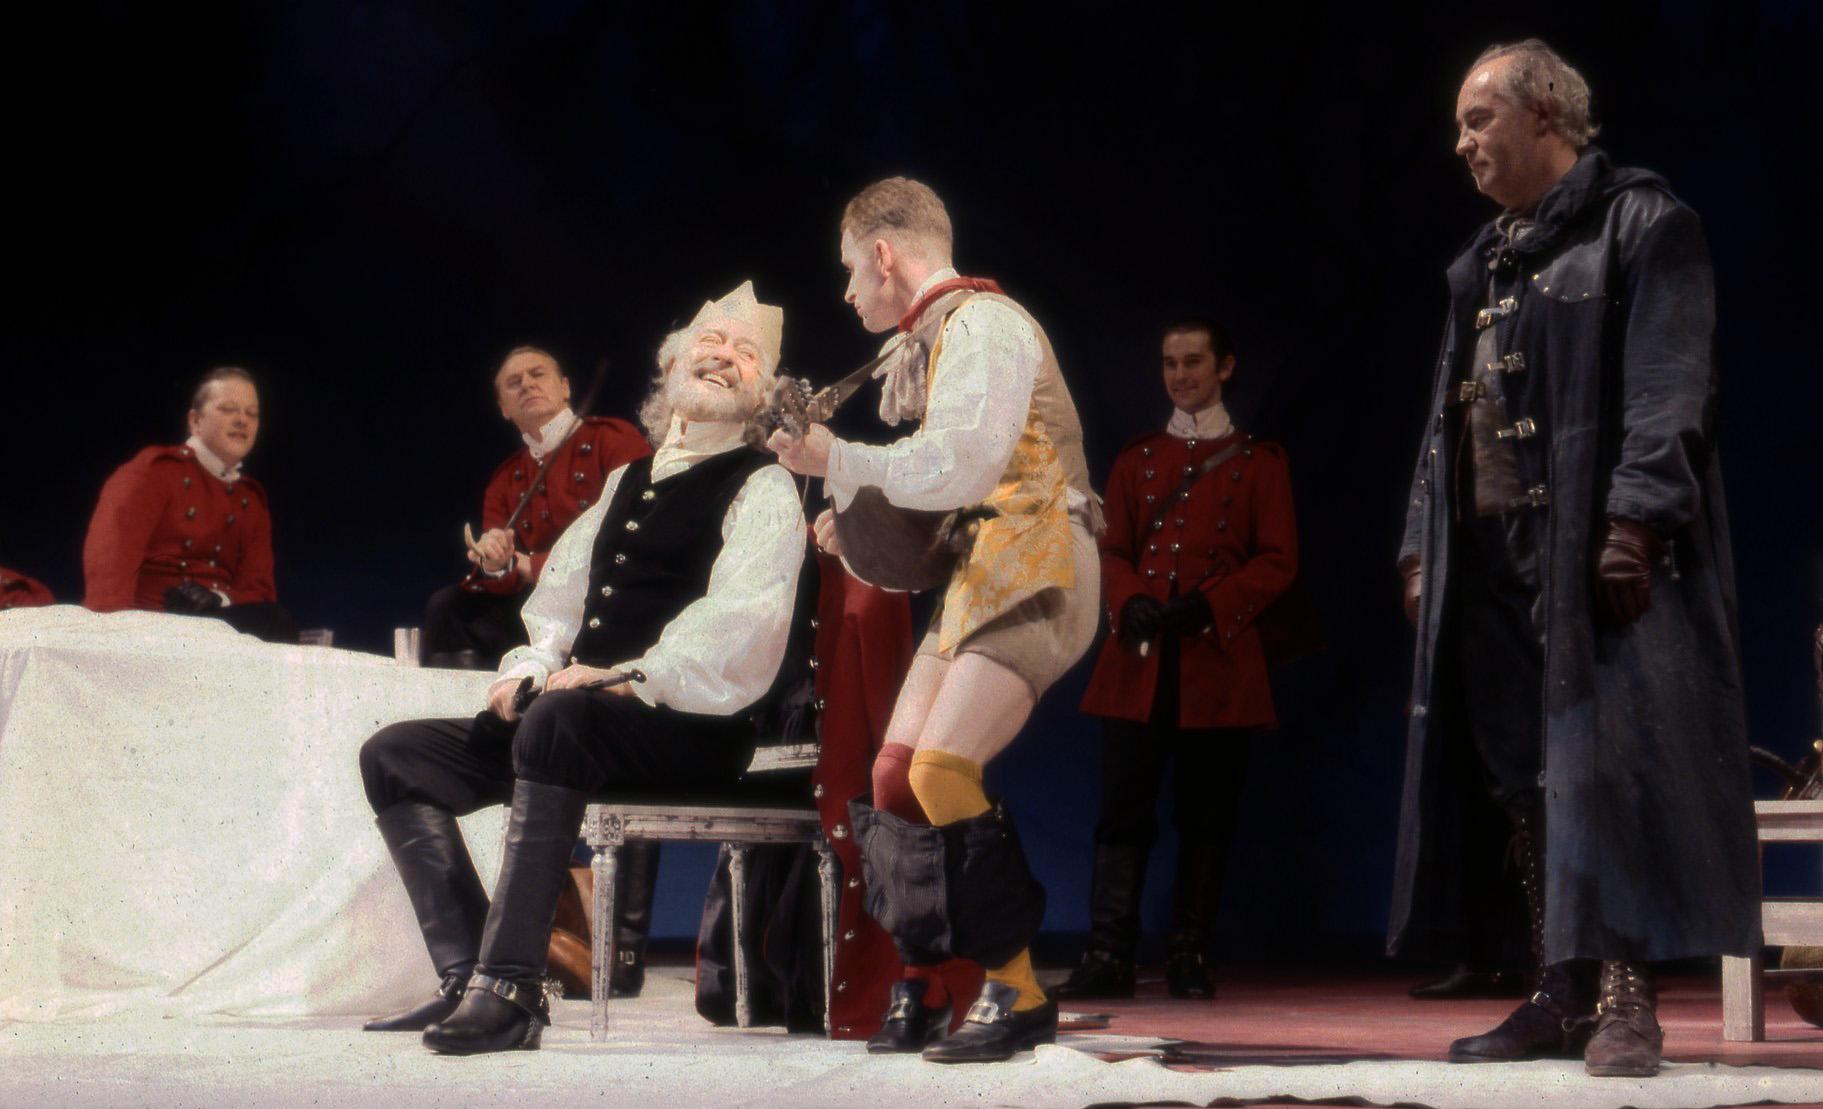 adrian noble 1993 production king lear royal shakespeare company